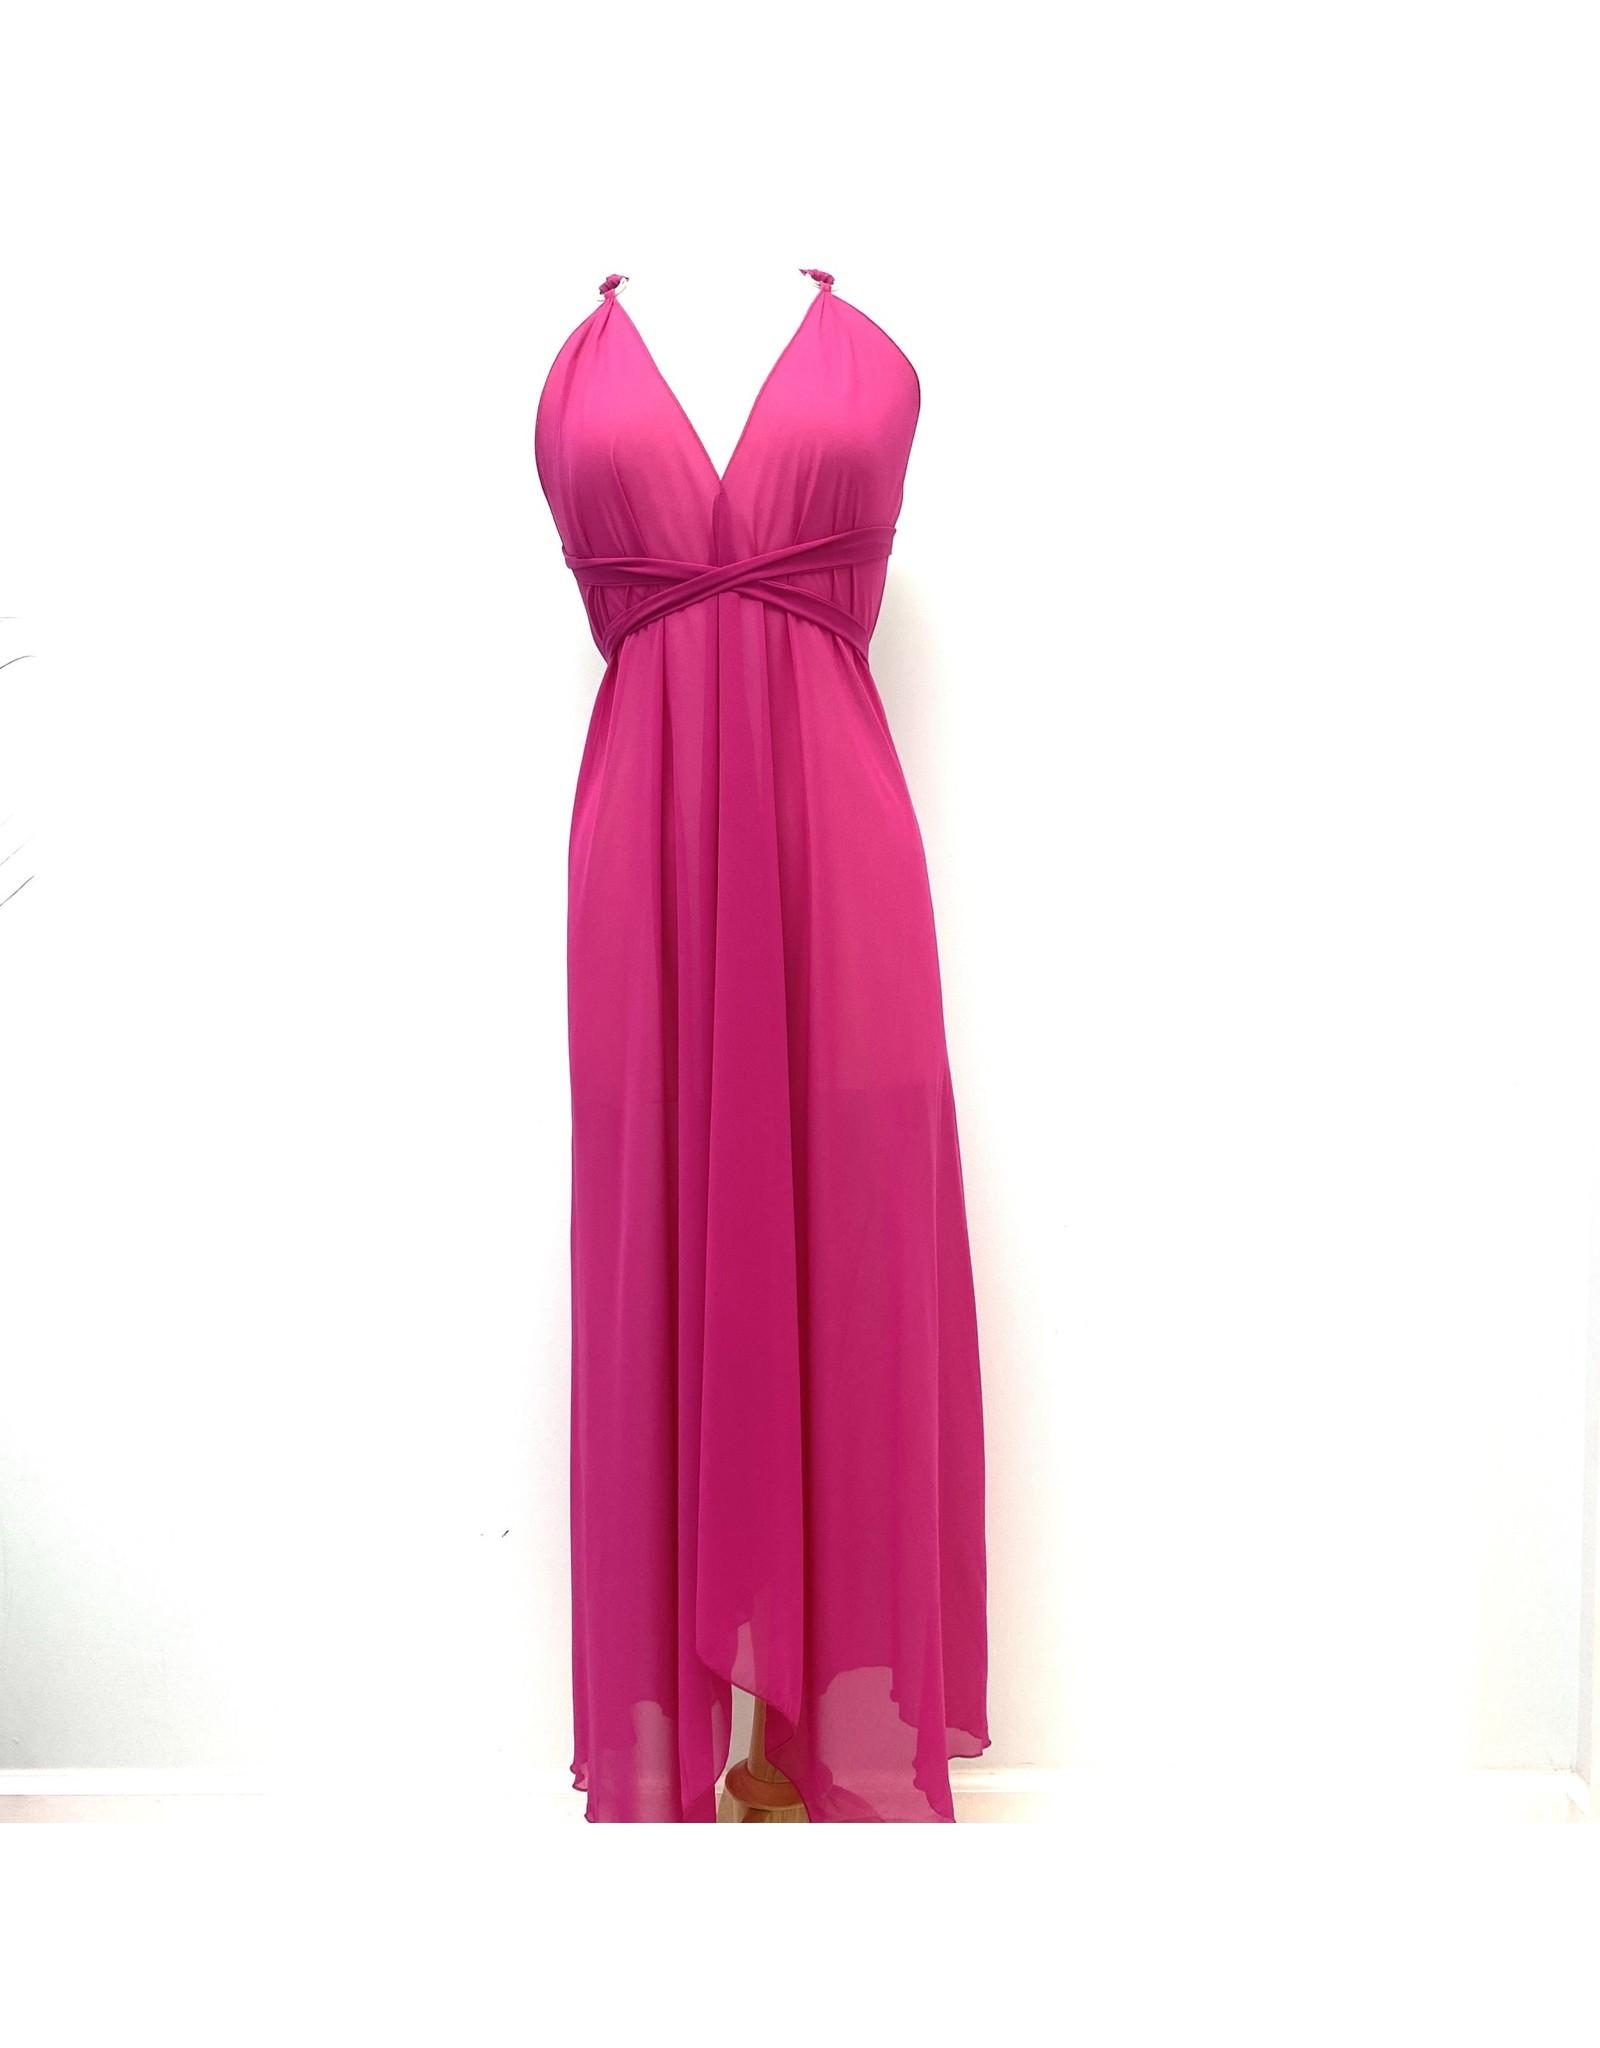 Indian Tropical Fashions Fuchsia Sheer Scarf Dress